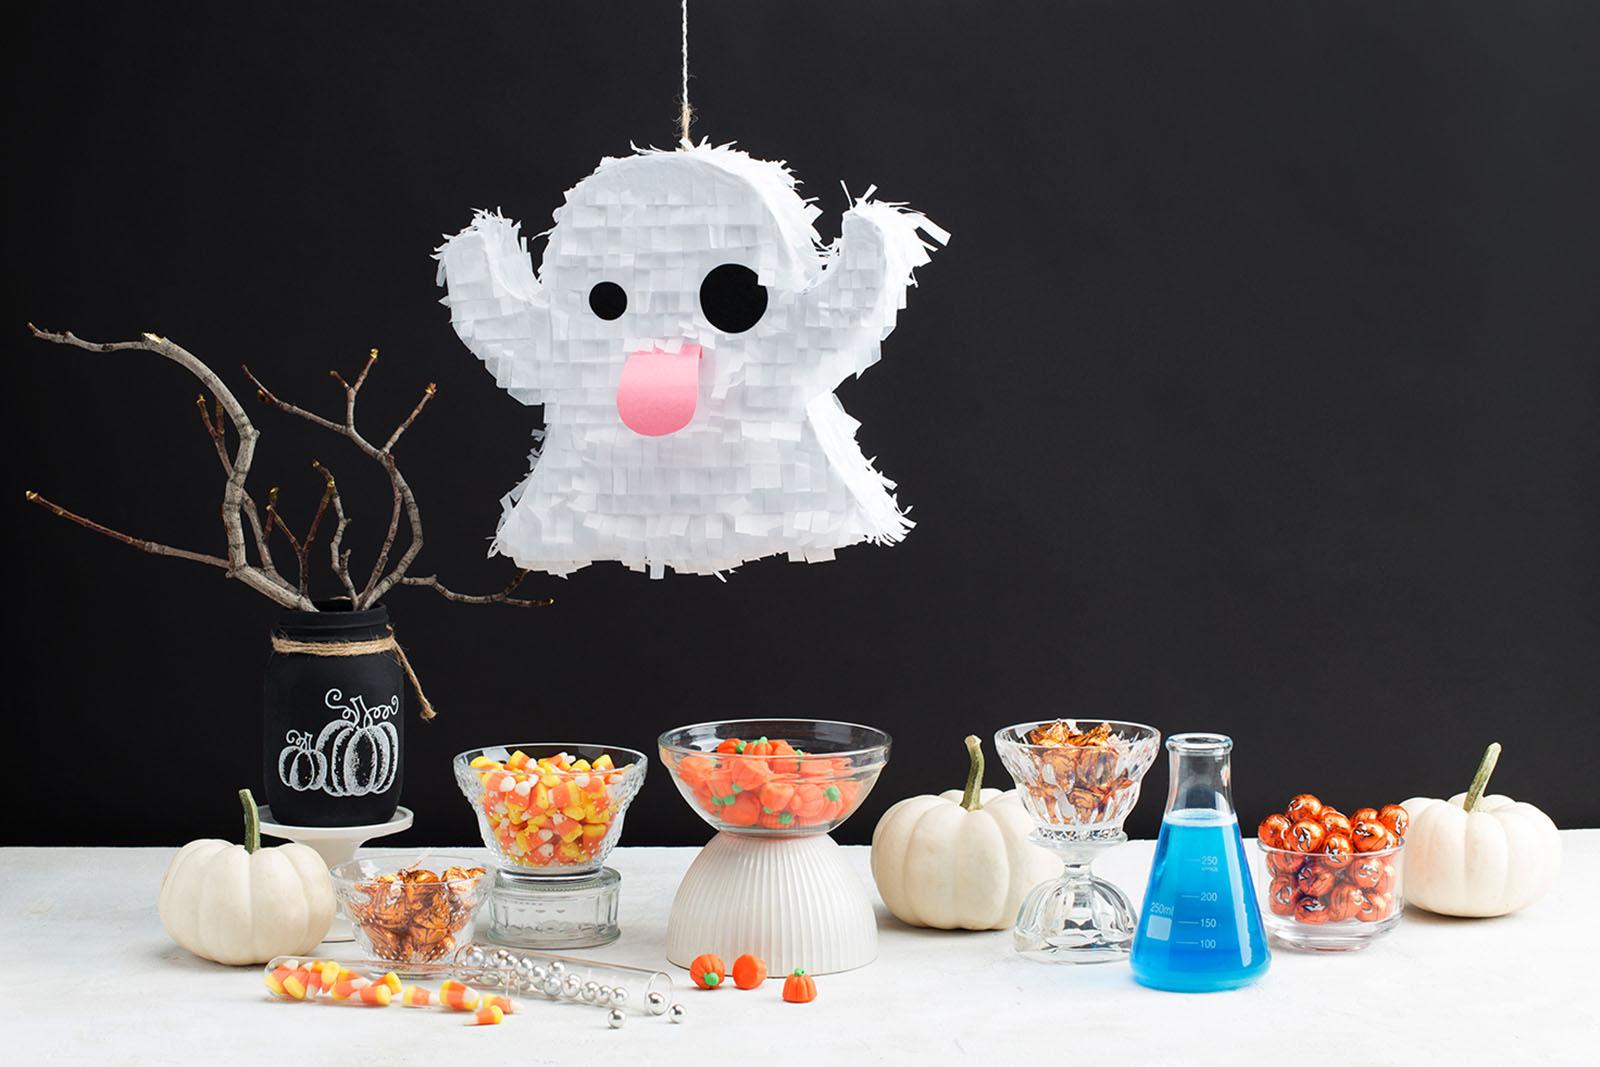 DIY cute and fun Halloween ghost pinata